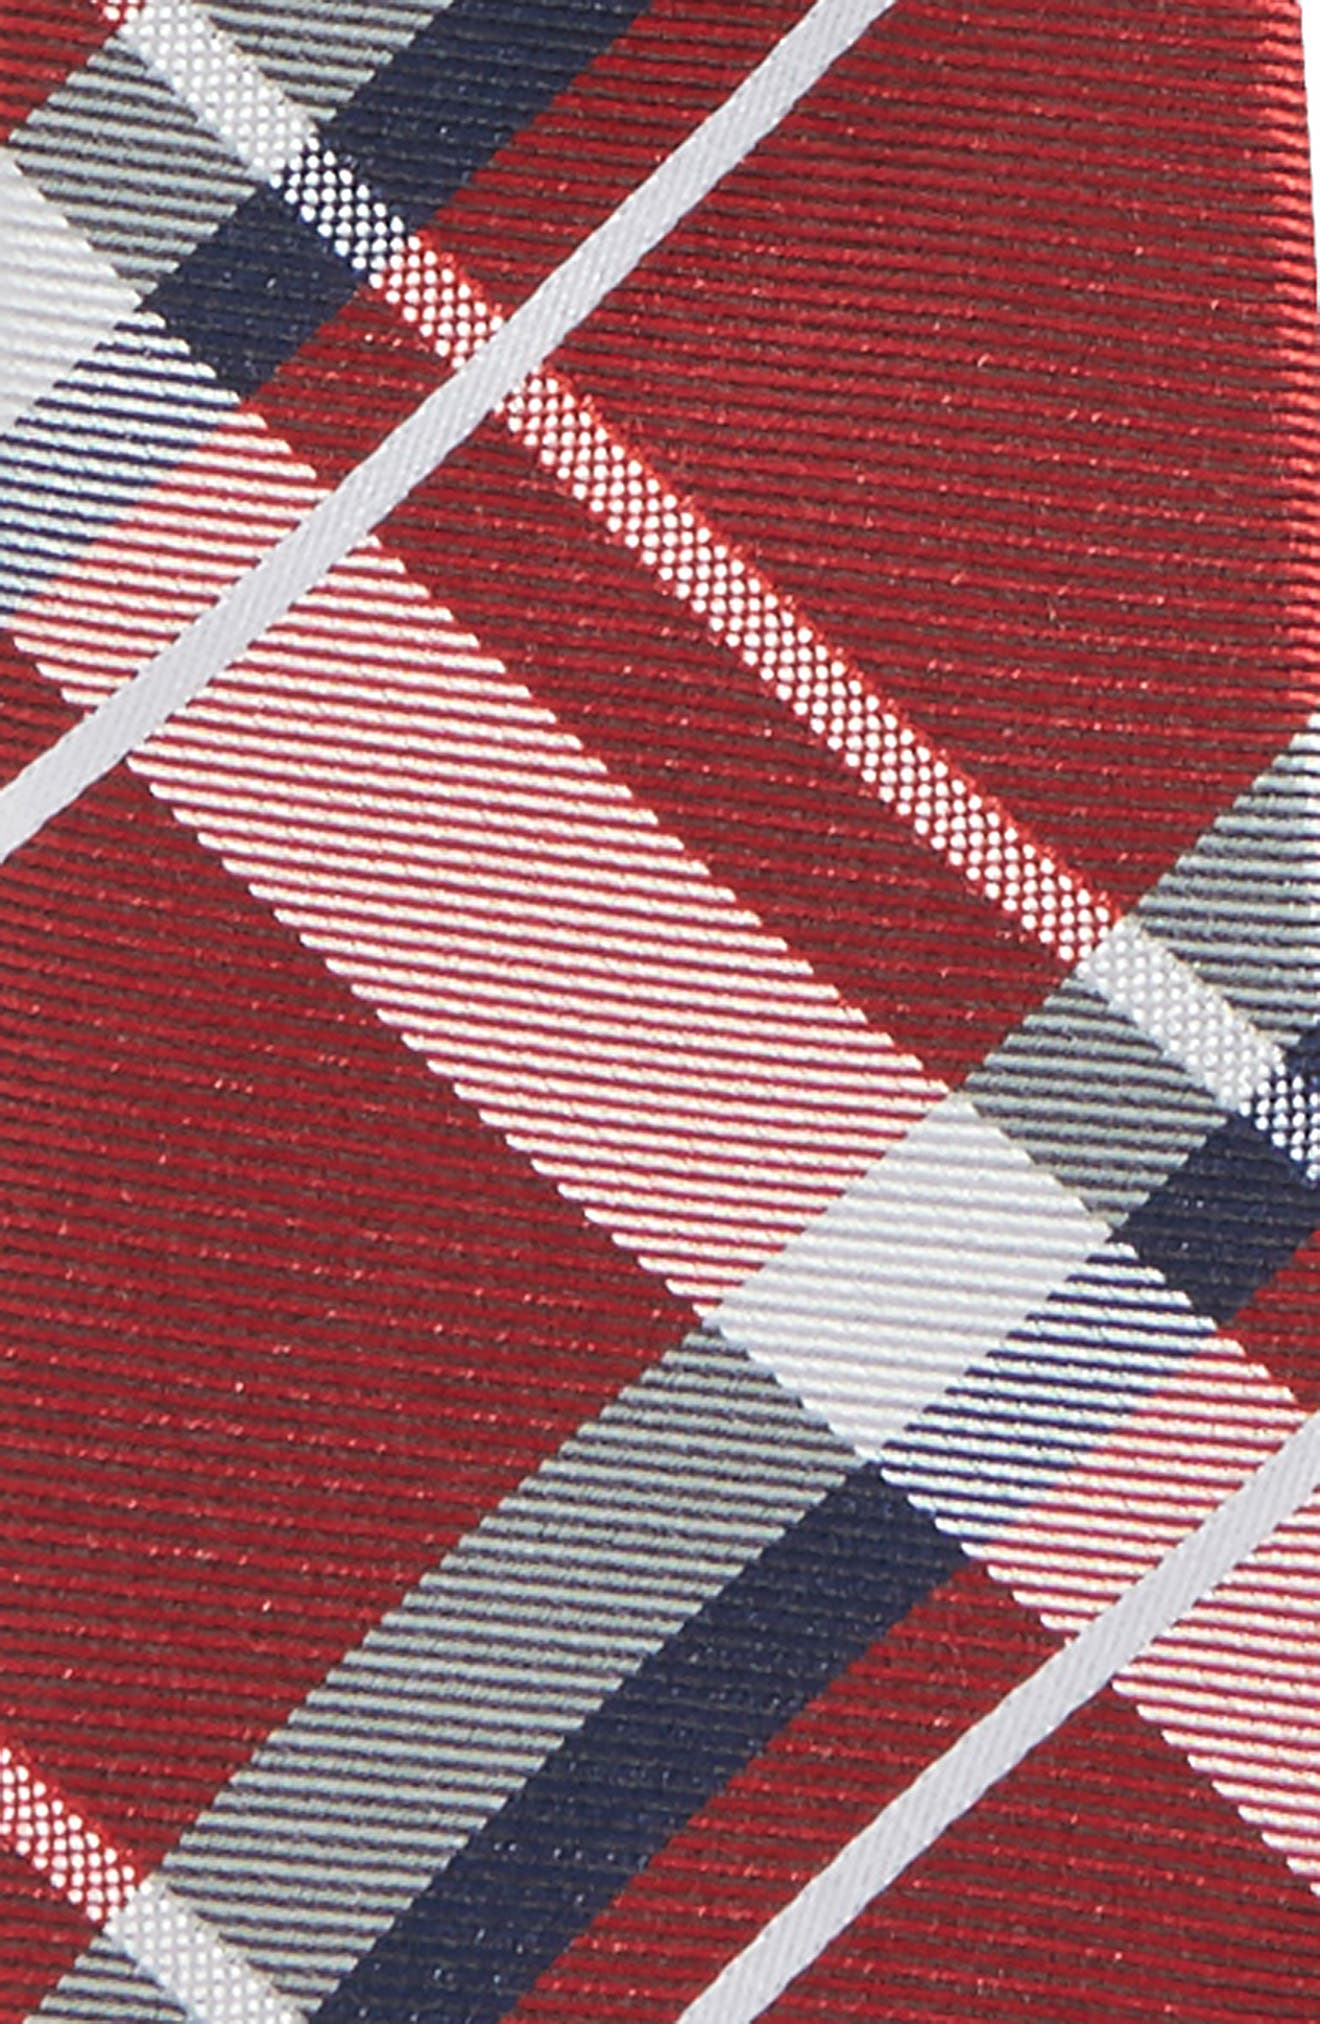 Plaid Silk Zip Tie,                             Alternate thumbnail 13, color,